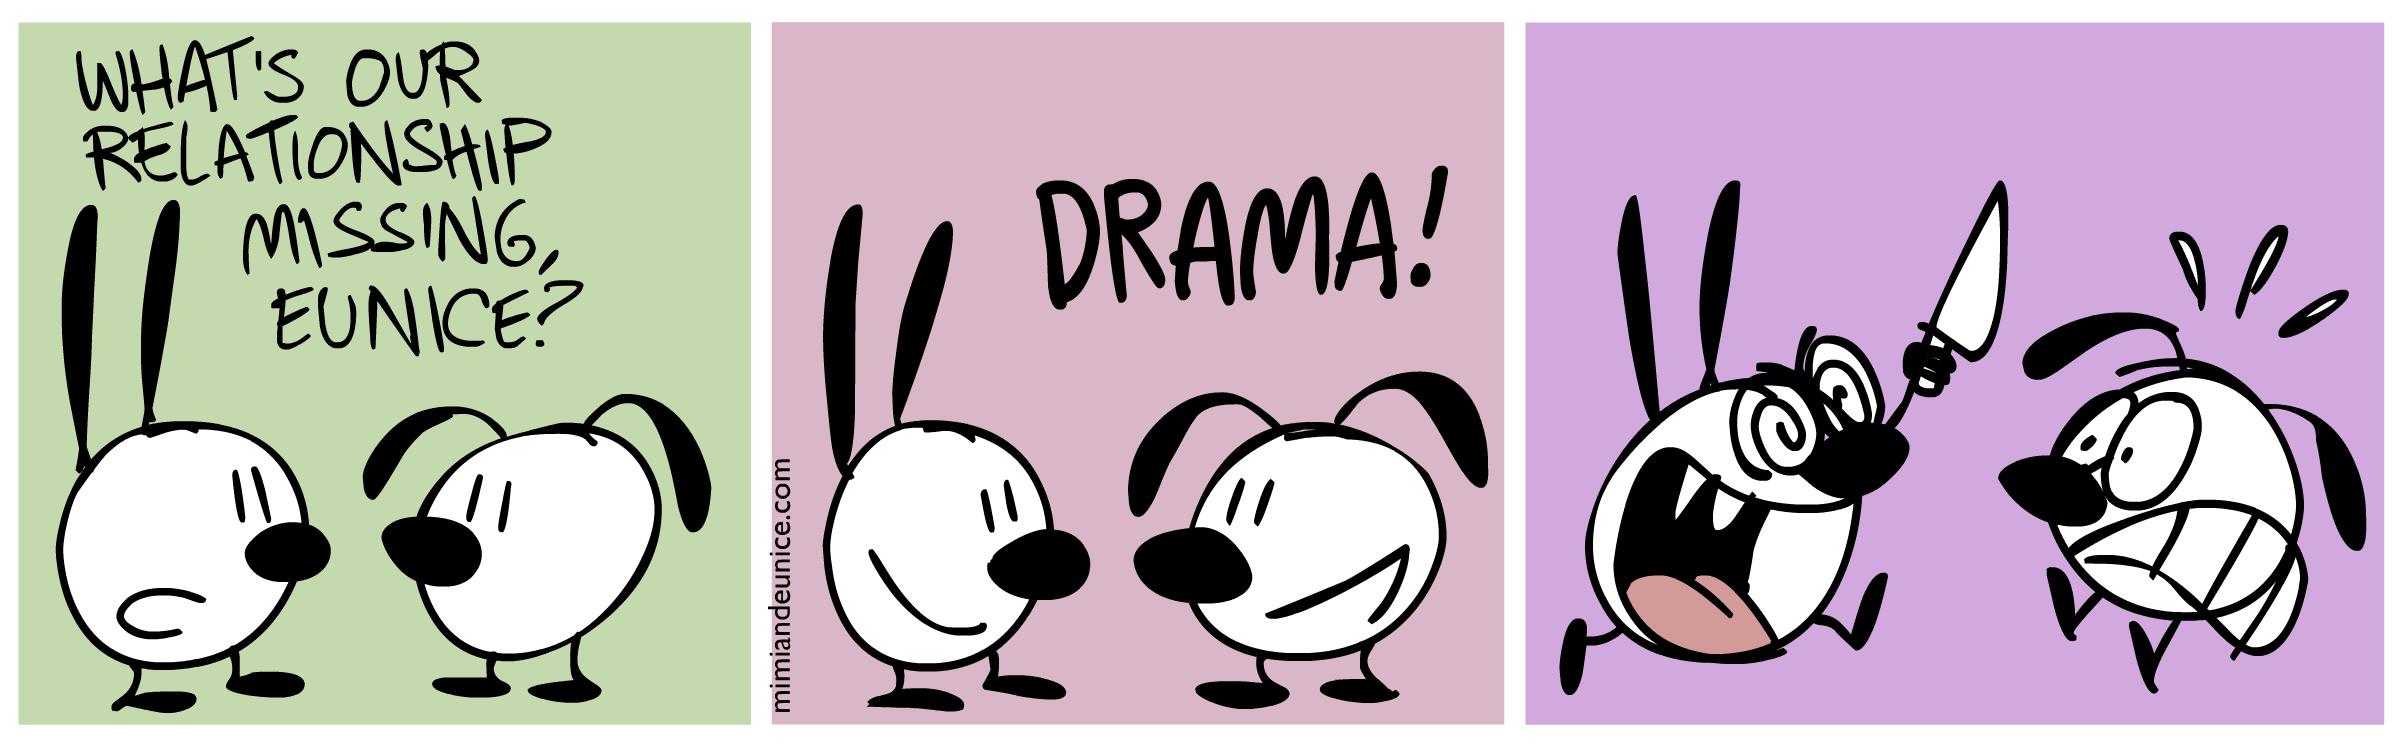 Drama Net Worth